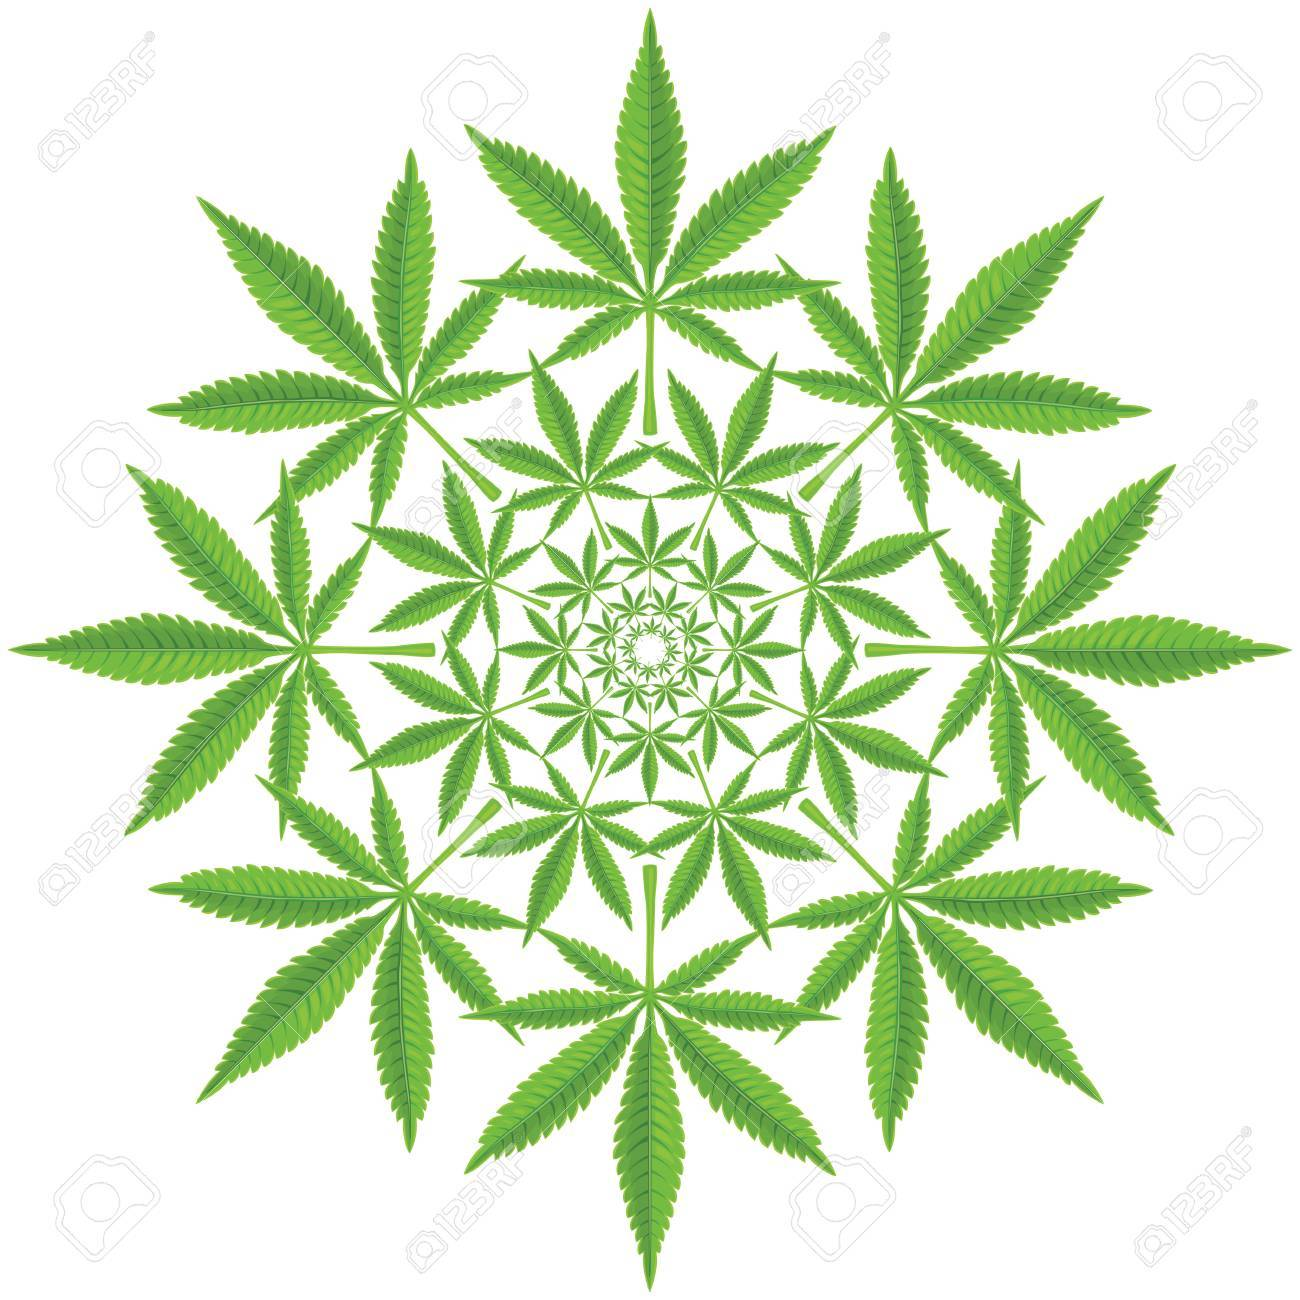 Round pattern from cannabis leaf - 60981852